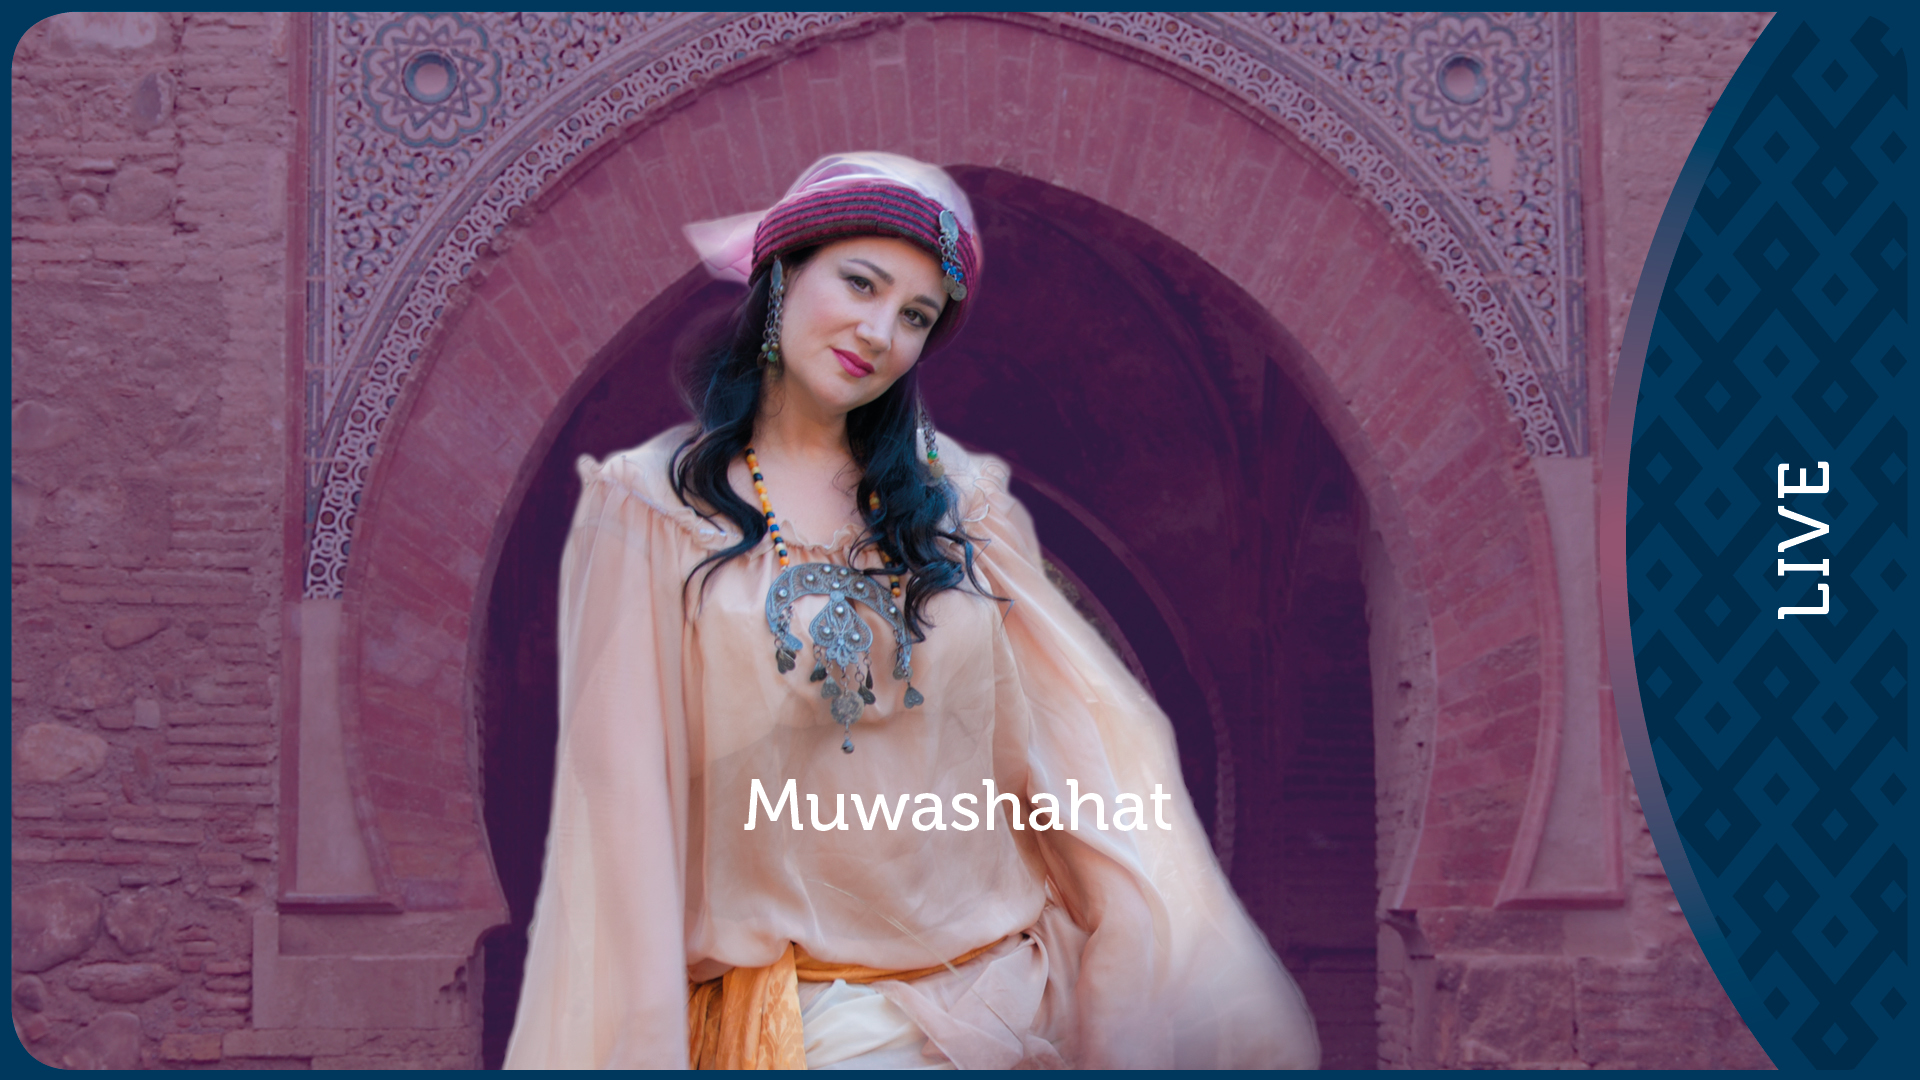 Muwashahat : Iqa' Muhajjar